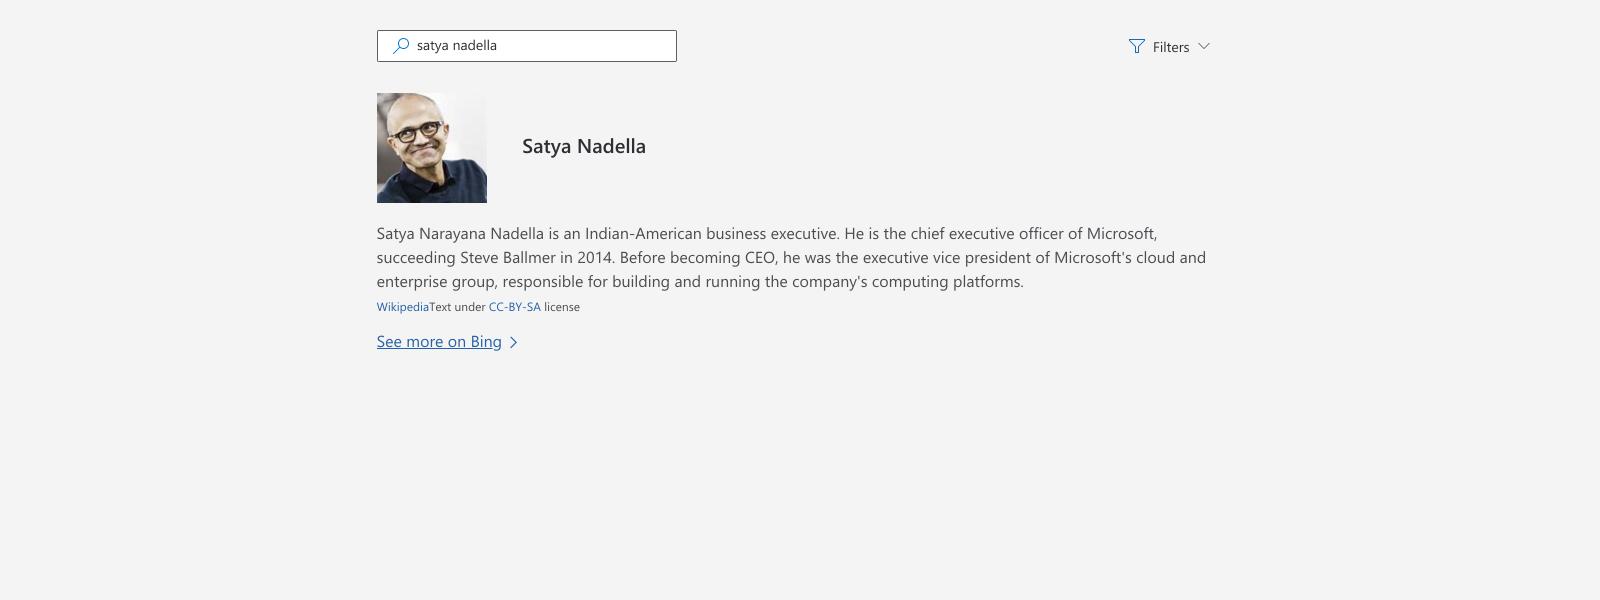 Illustration of looking up information about Satya Nadella.